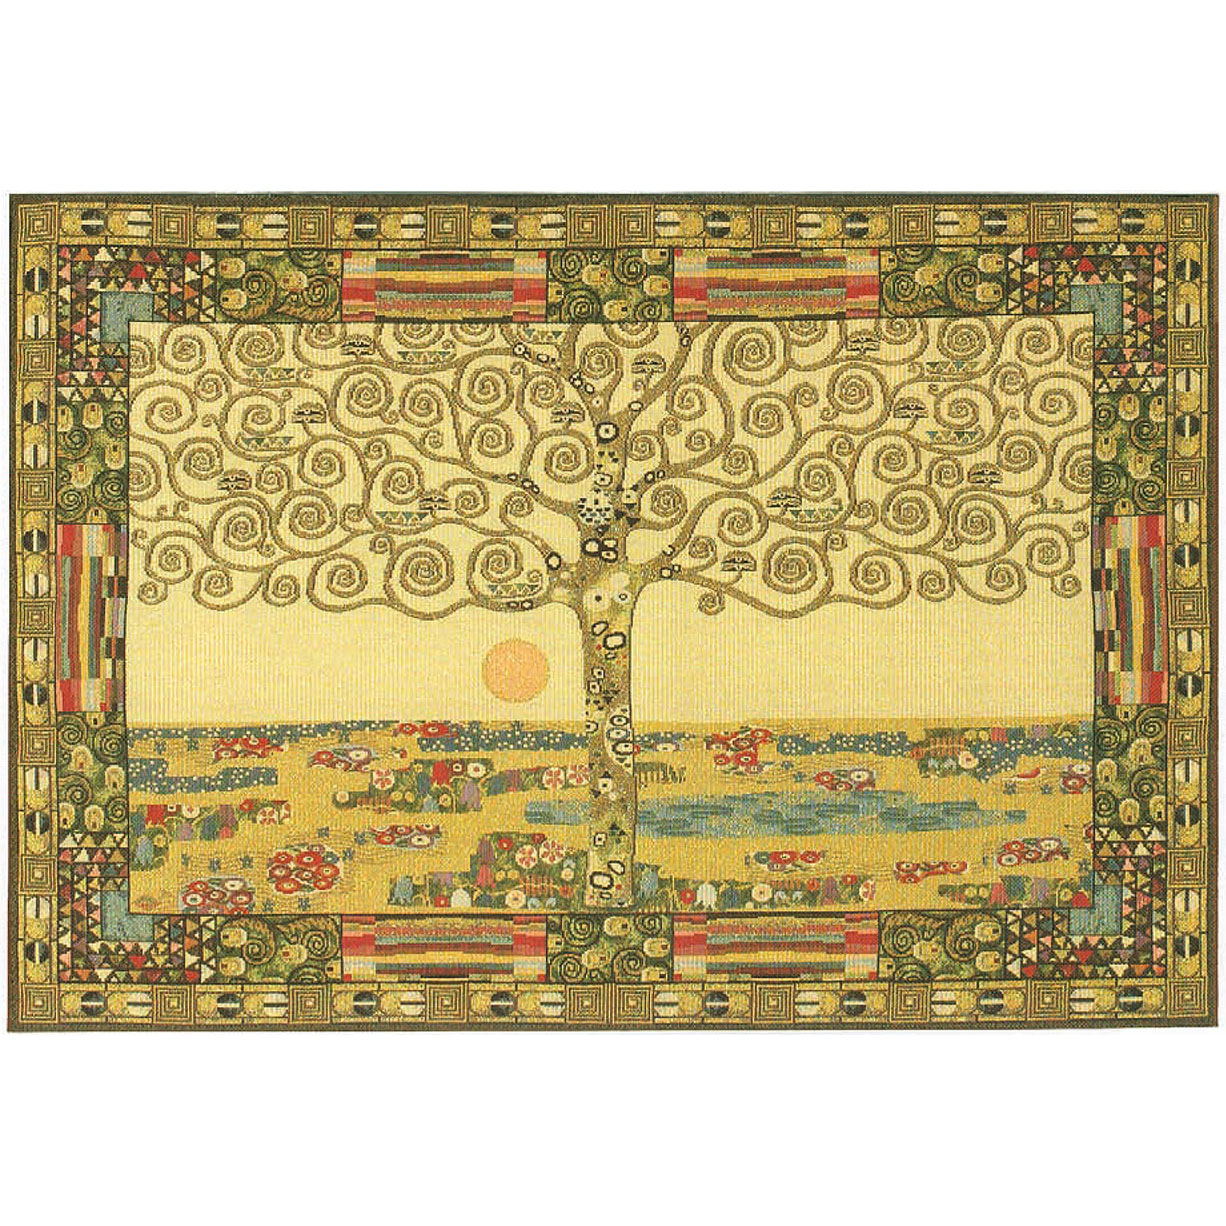 Luka, T1489х1 Tree of Live Gustav Klimt <br> Гобелен Дерево жизни Густав Климт <br>размеры 135х095, 155х065